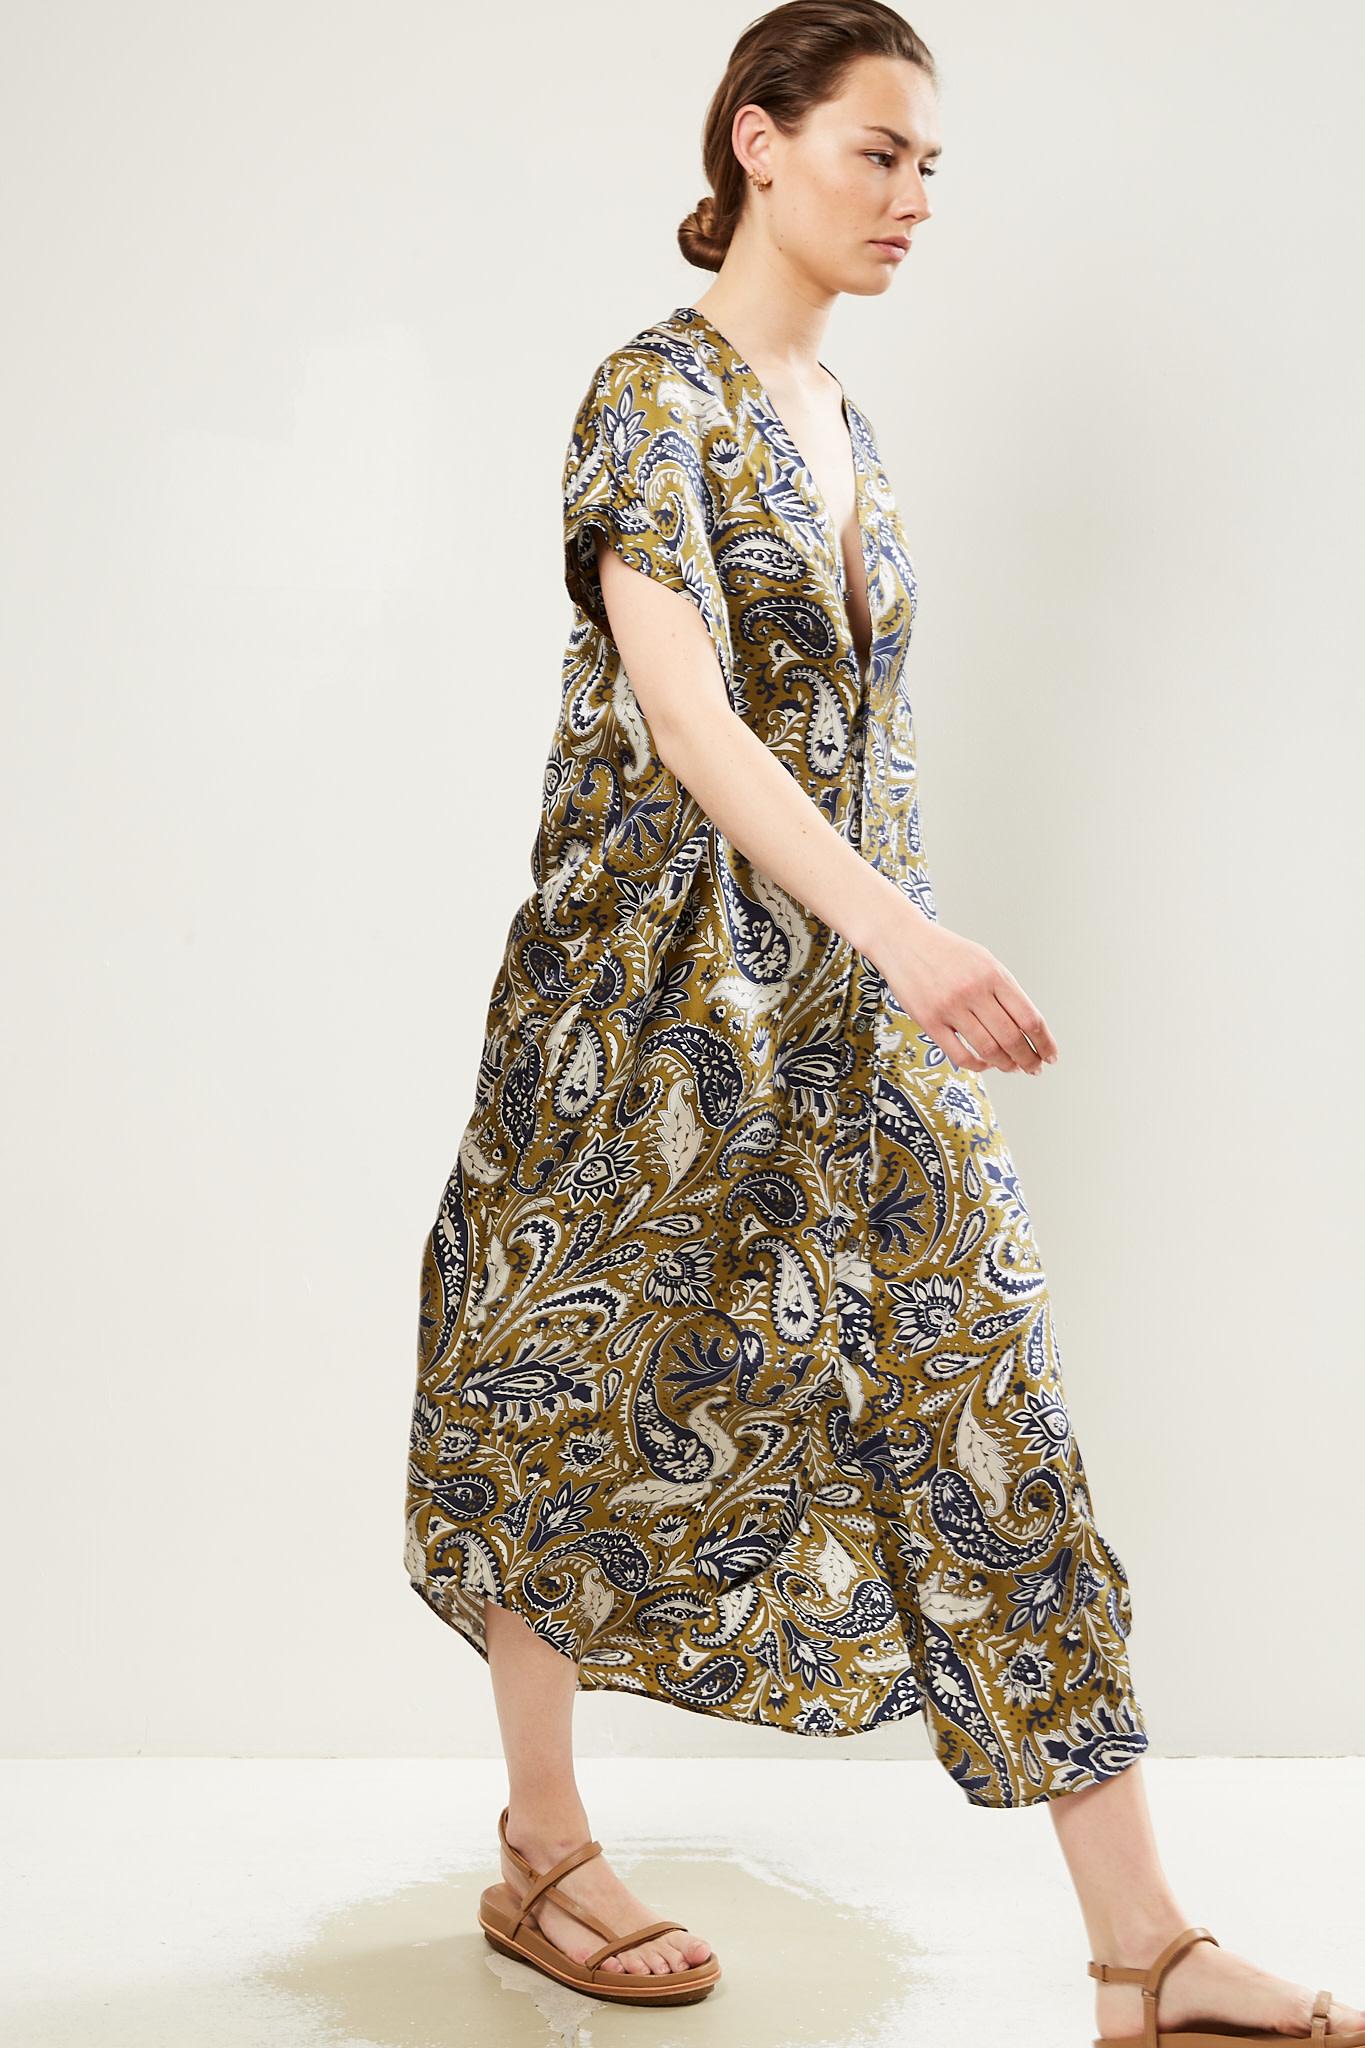 bananatime V dress jumbo paisley shirt